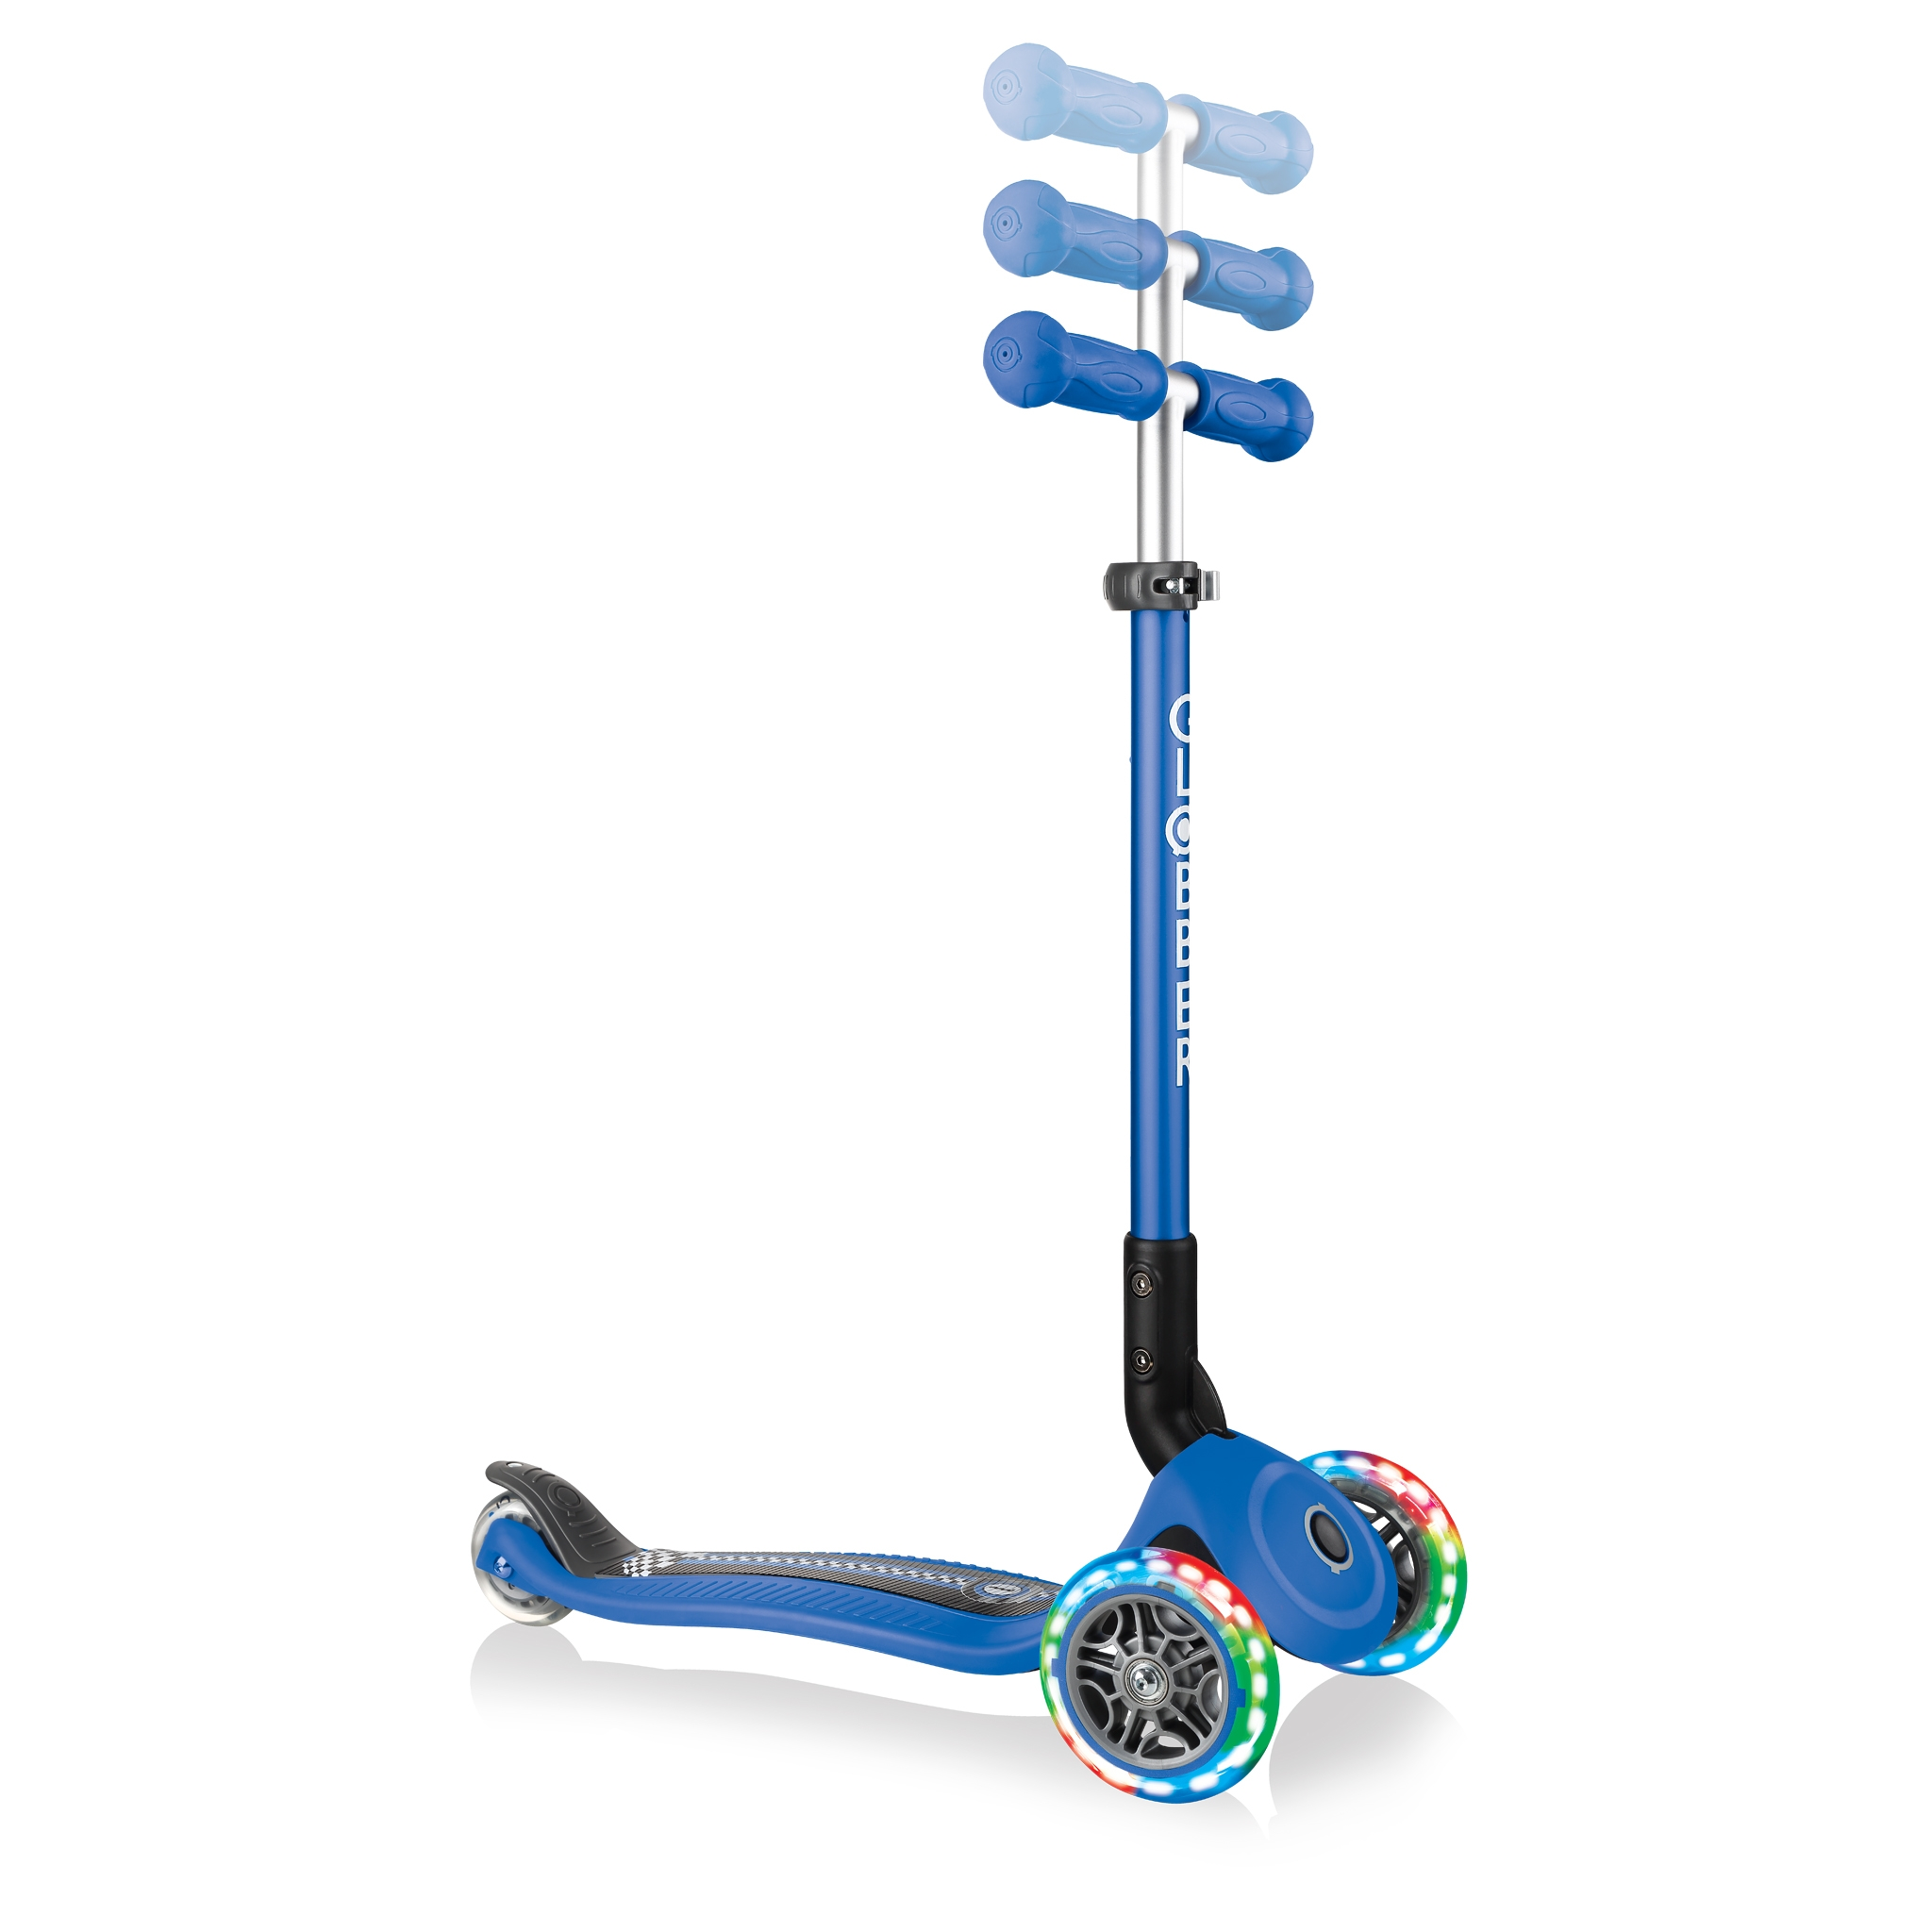 primo-foldable-fantasy-lights-3-wheel-light-up-scooter-with-adjustable-T-bar